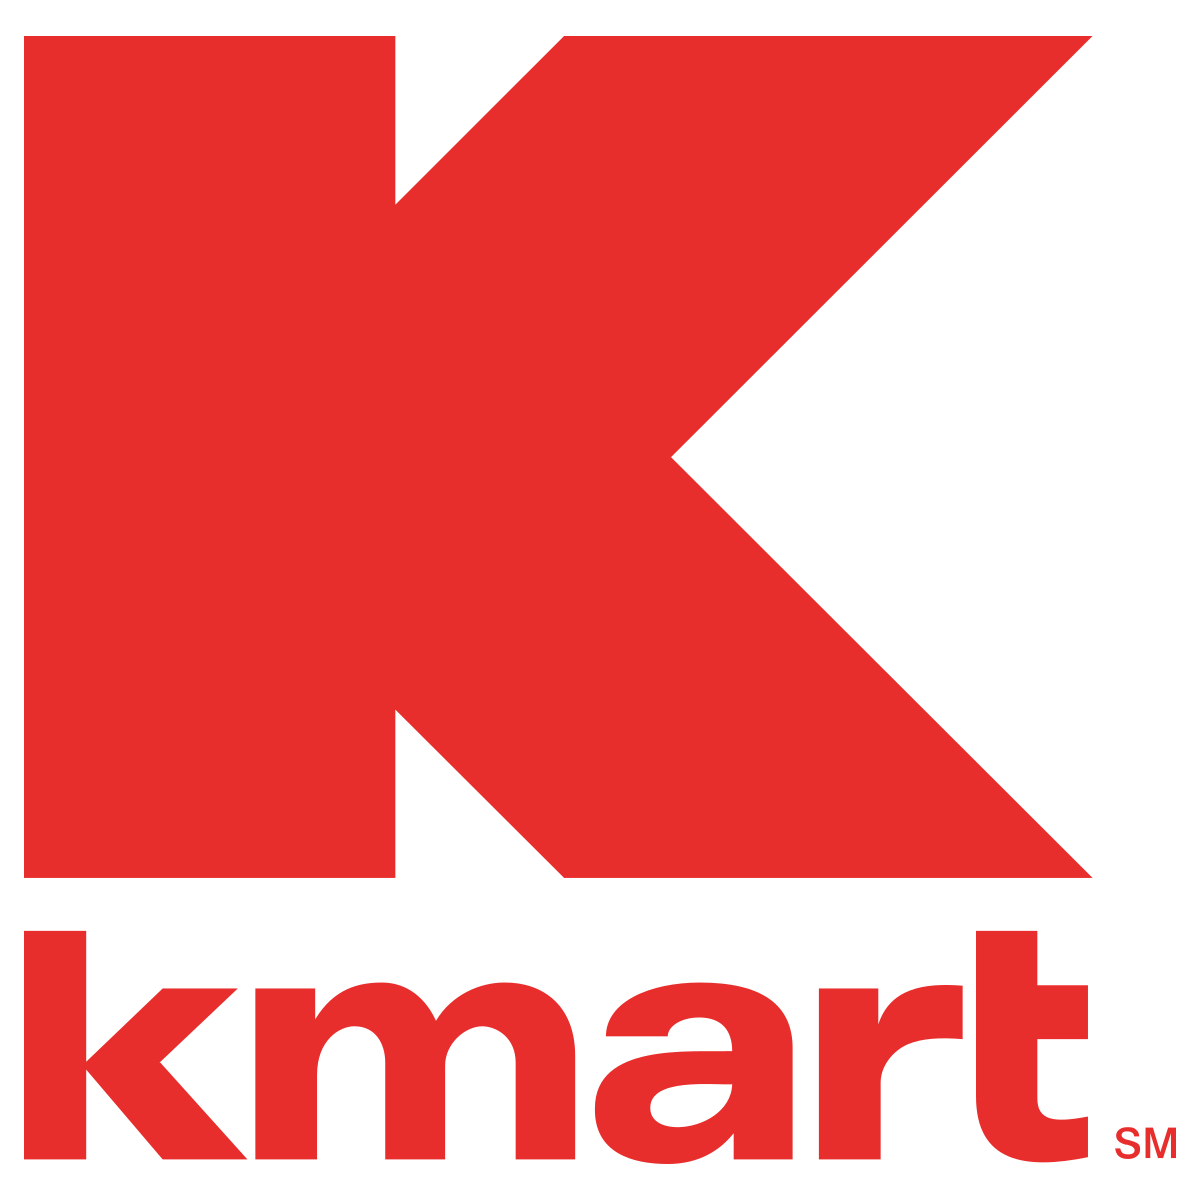 Kmart.